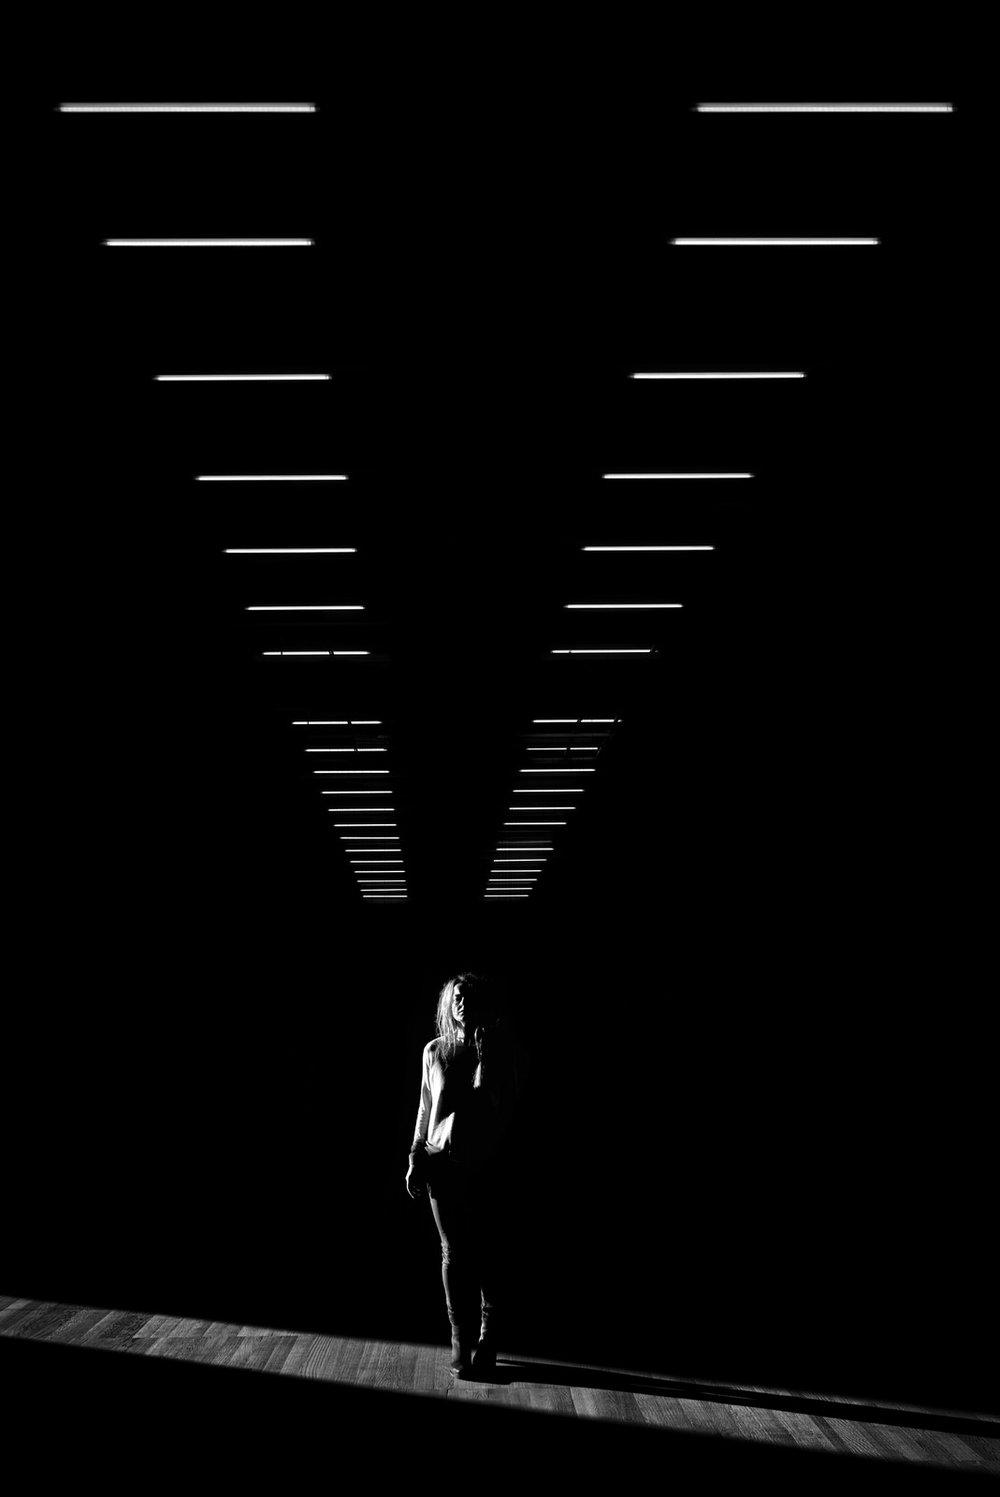 Alan Schaller - London Street Photographer - Metropolis26.jpg